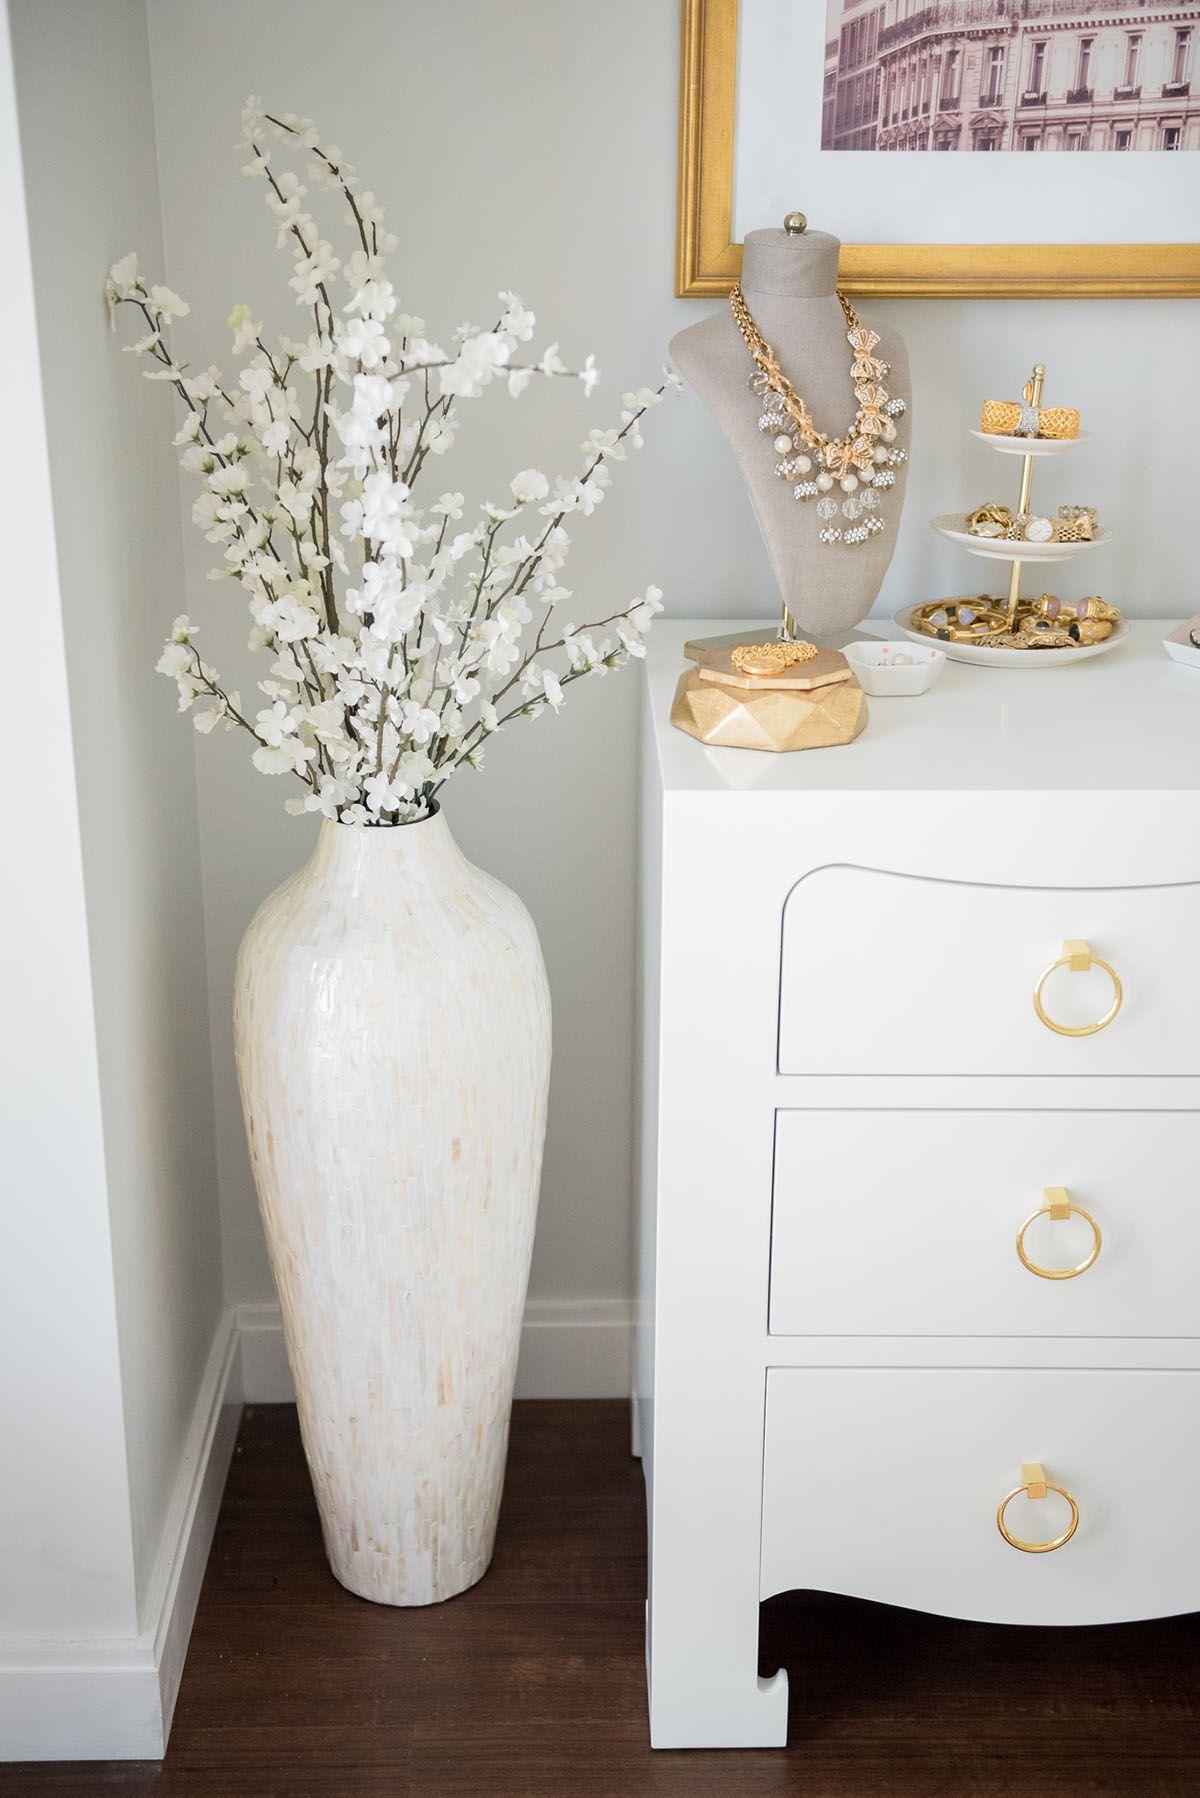 10 Ways To Fill Empty Corners With Floor Vases Floor Vase Decor Chic Bedroom Design Home Decor Vases